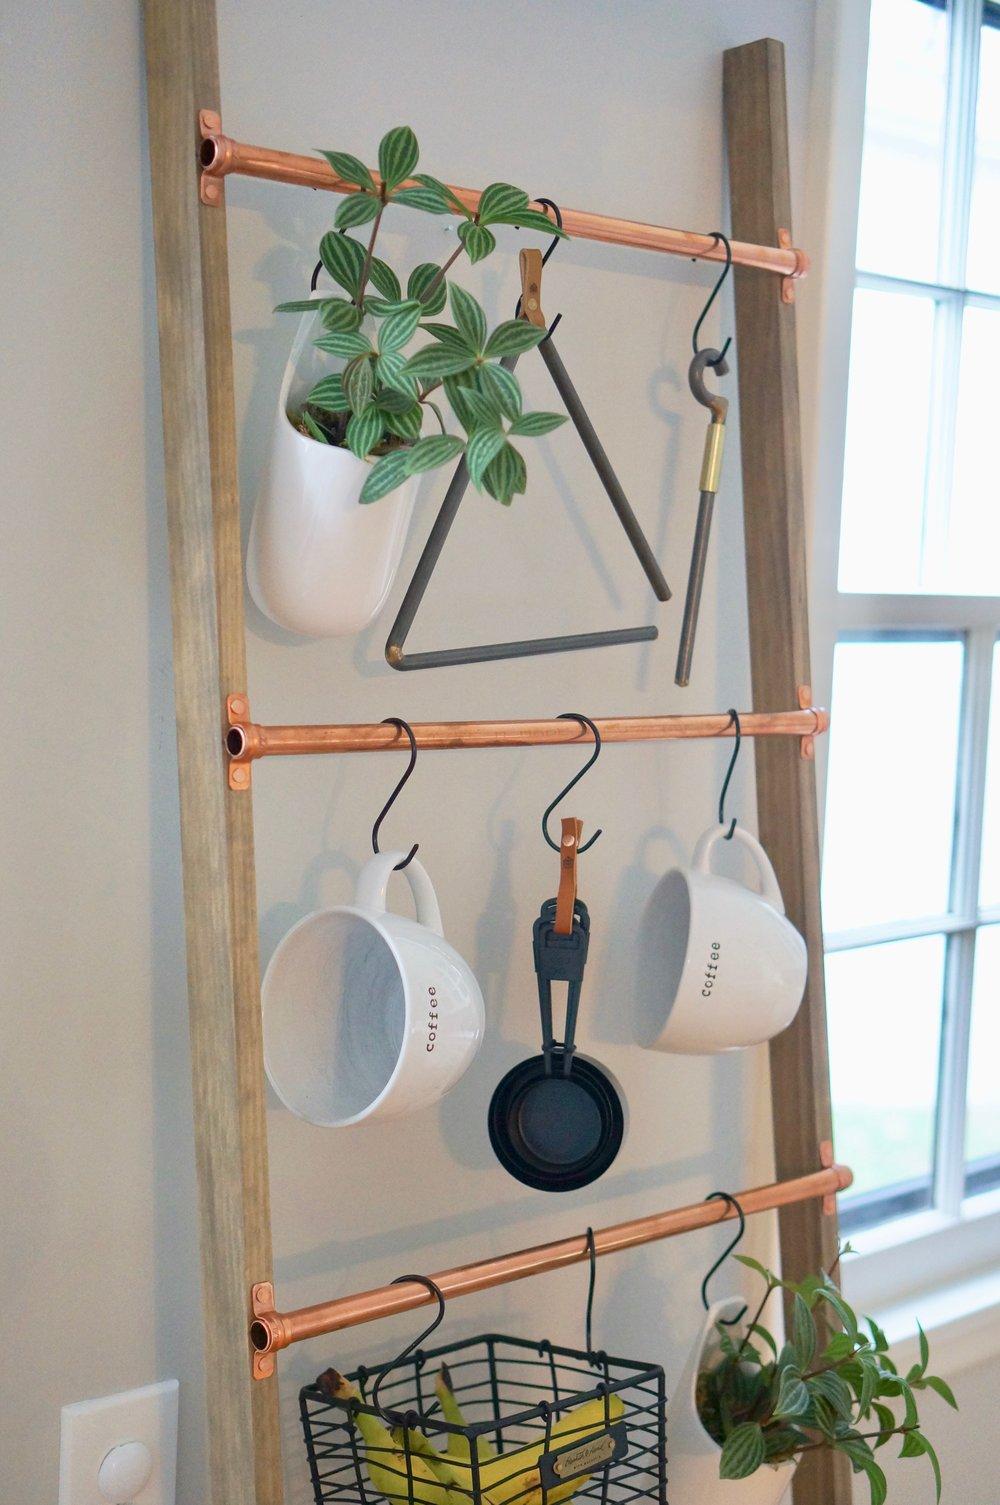 kitchen items organized on a blanket ladder